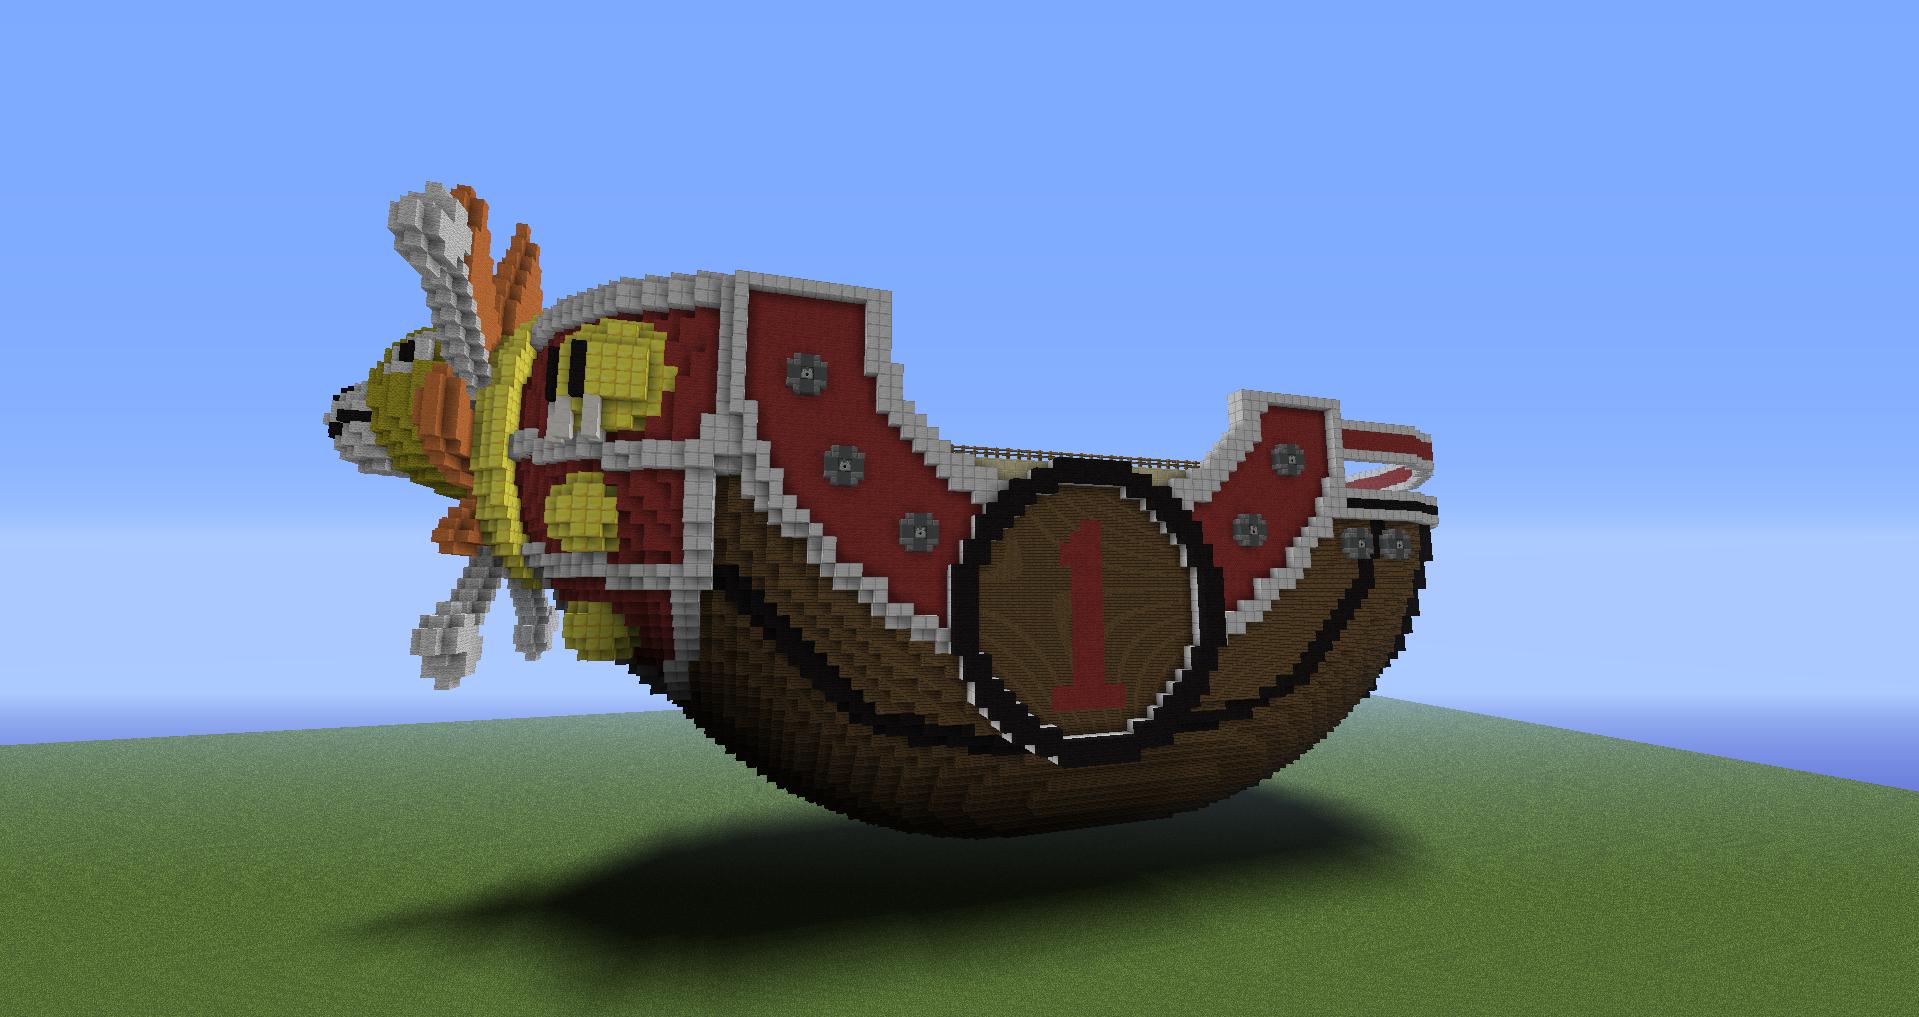 New One Piece Minecraft Project Part 2 By Kimdrello On Deviantart